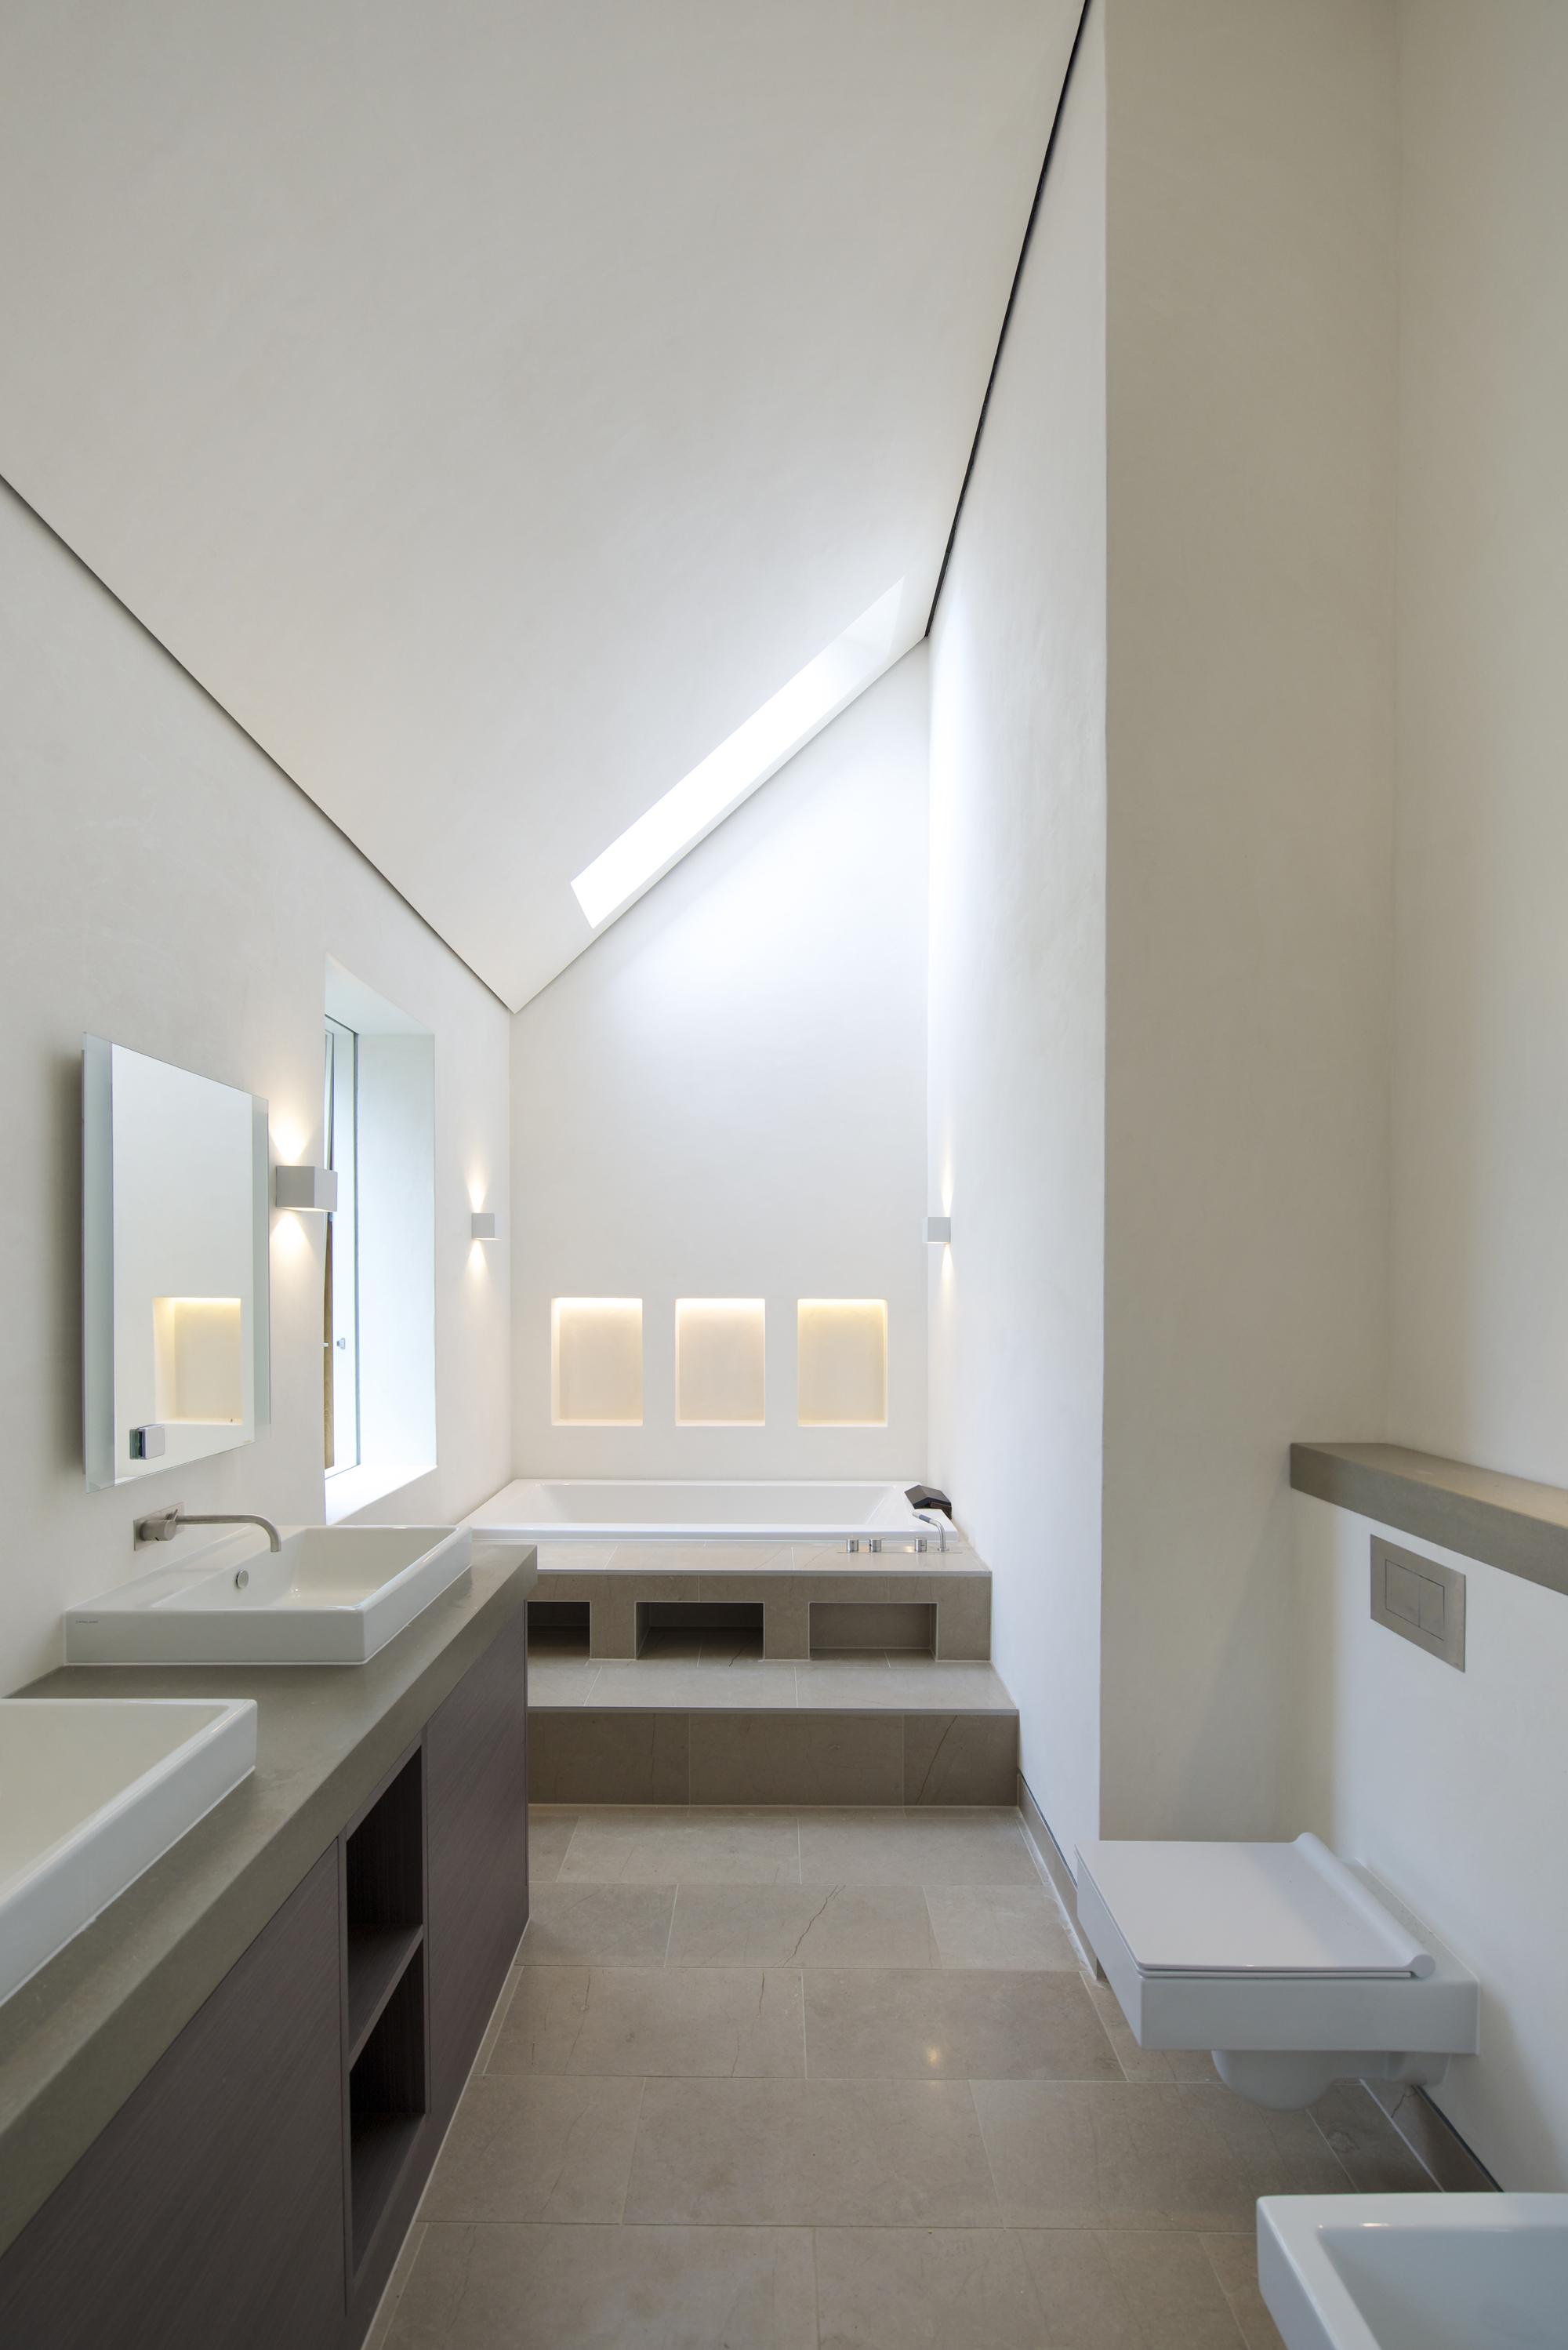 Gallery of new house little england farm bbm for Architect ltd